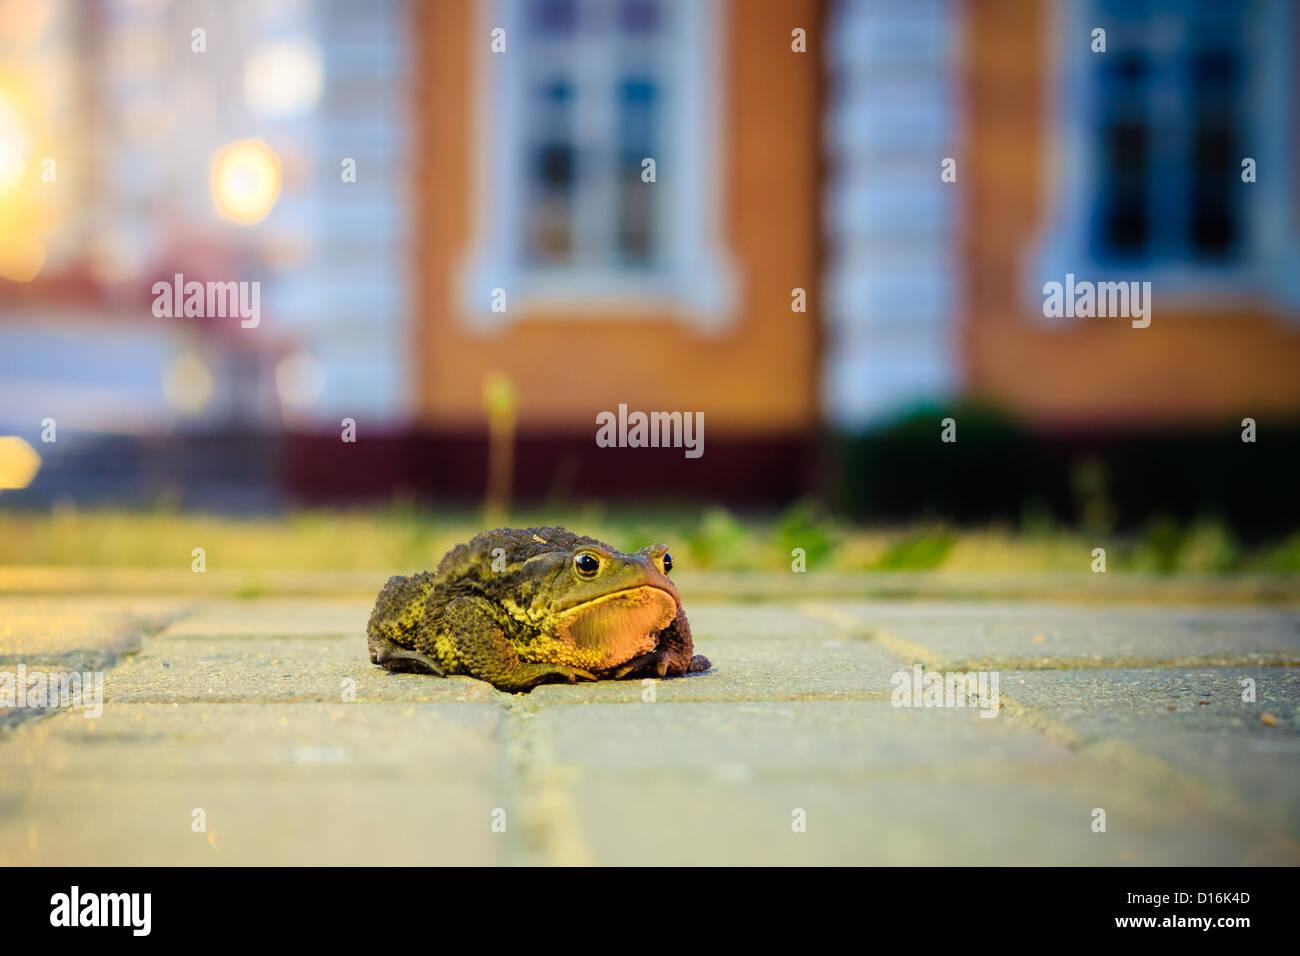 Nahaufnahme der Kröte in Nacht Stockbild